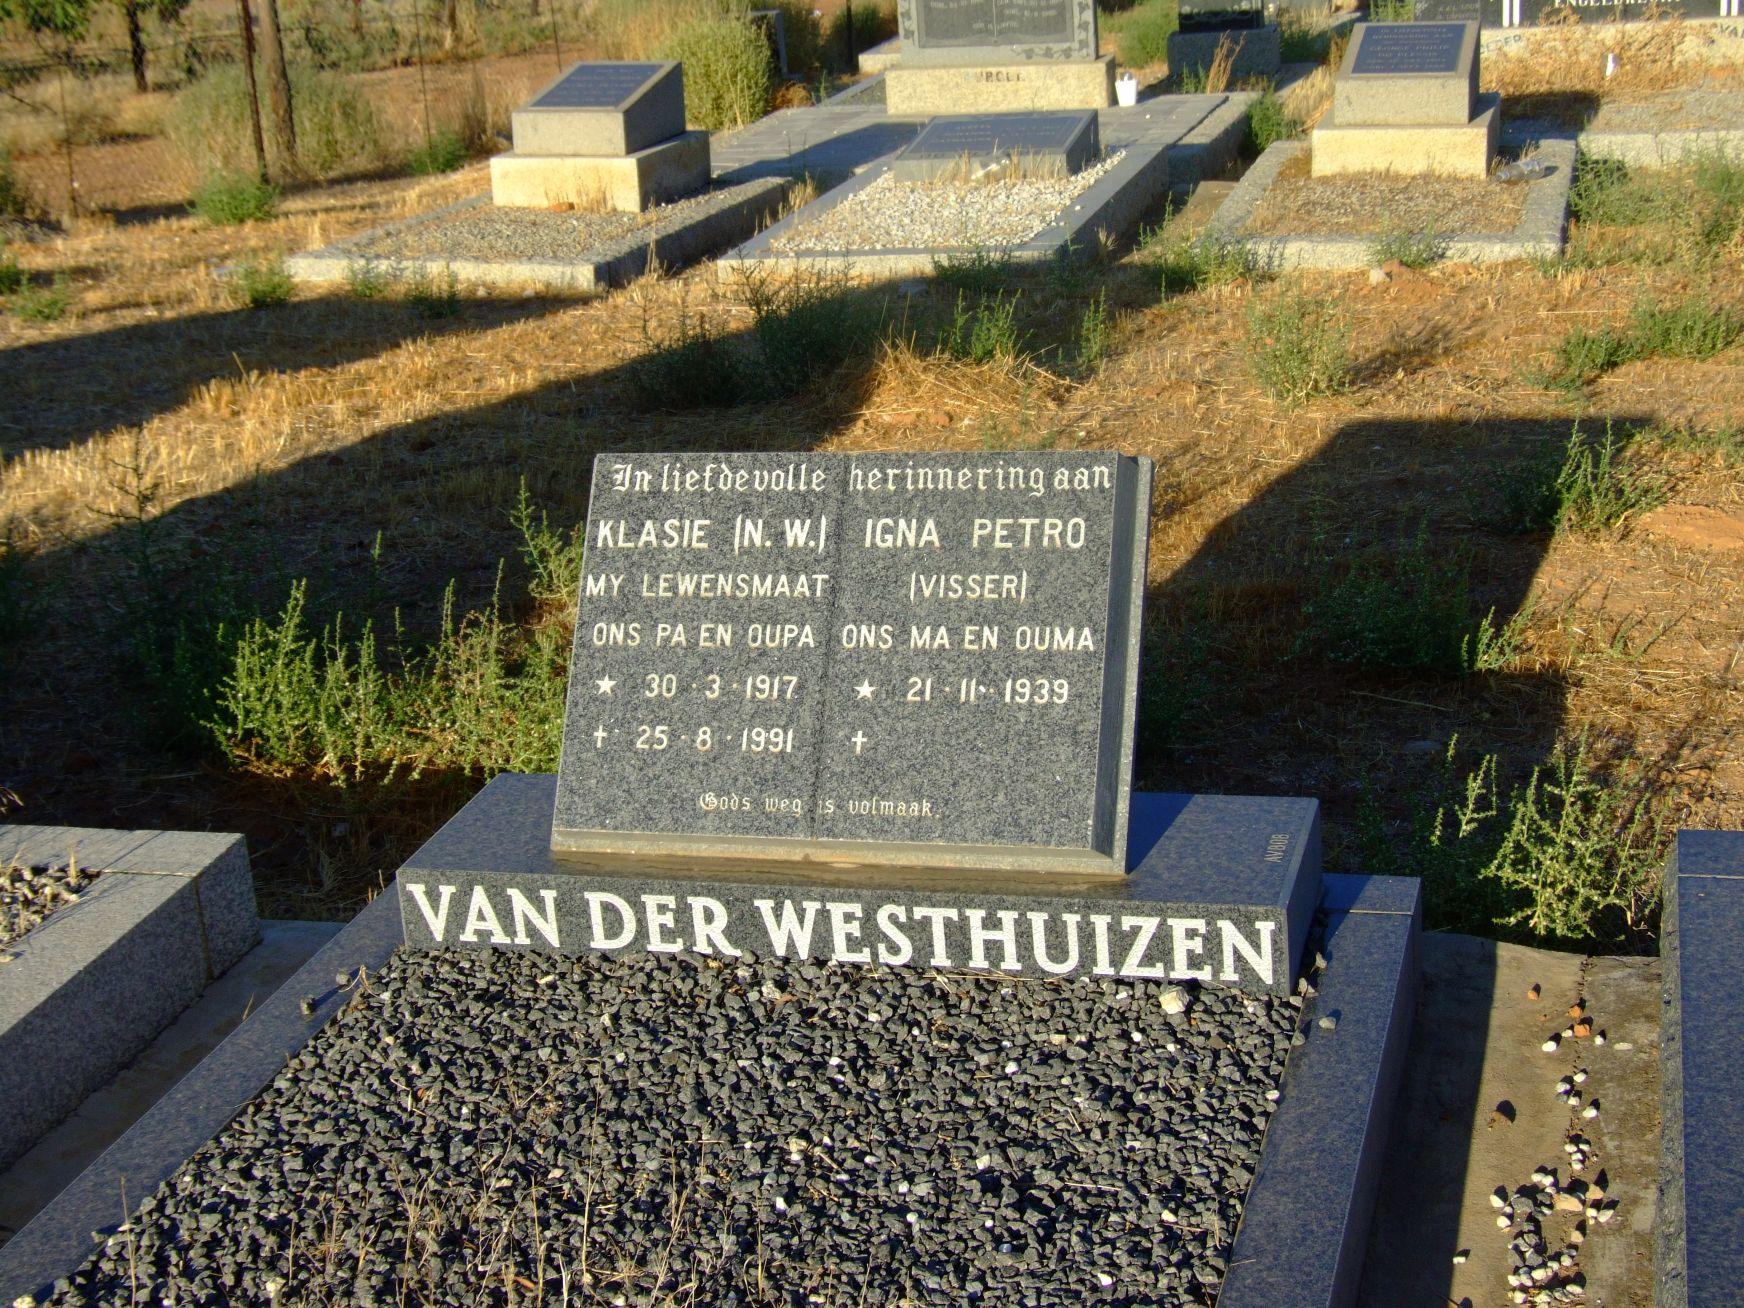 van der Westhuizen, Klasie (N.W.) and van der Westhuizen, Igna P